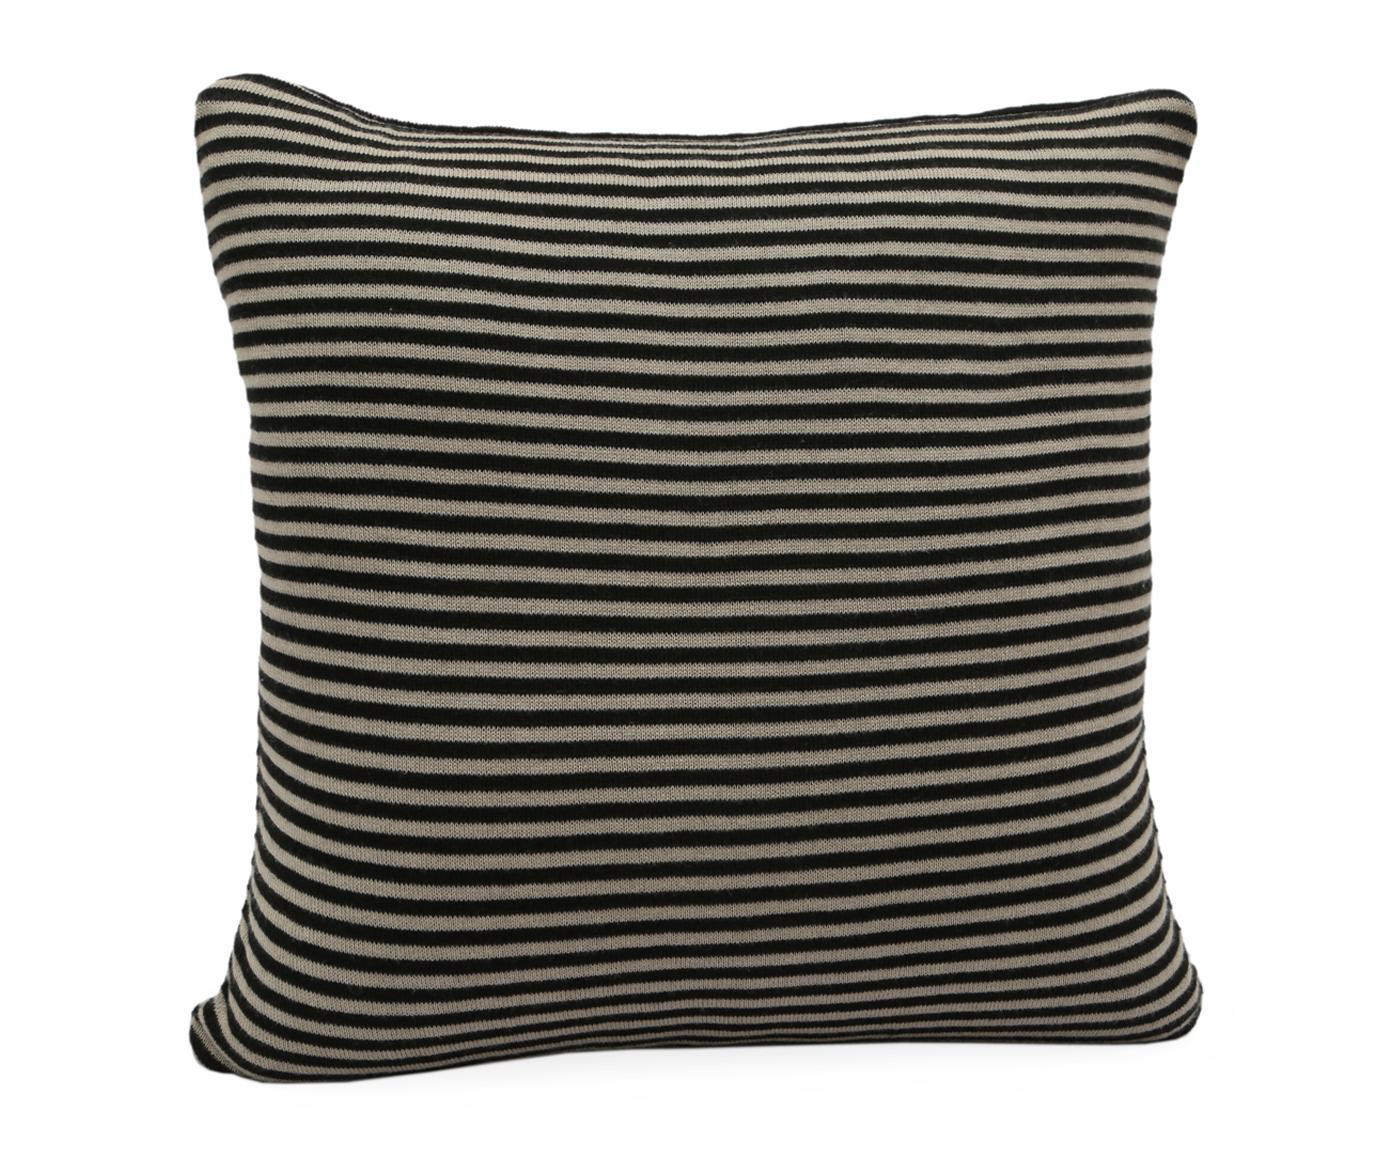 strick kissenh lle nigel schwarz taupe von port maine online kaufen hublery. Black Bedroom Furniture Sets. Home Design Ideas